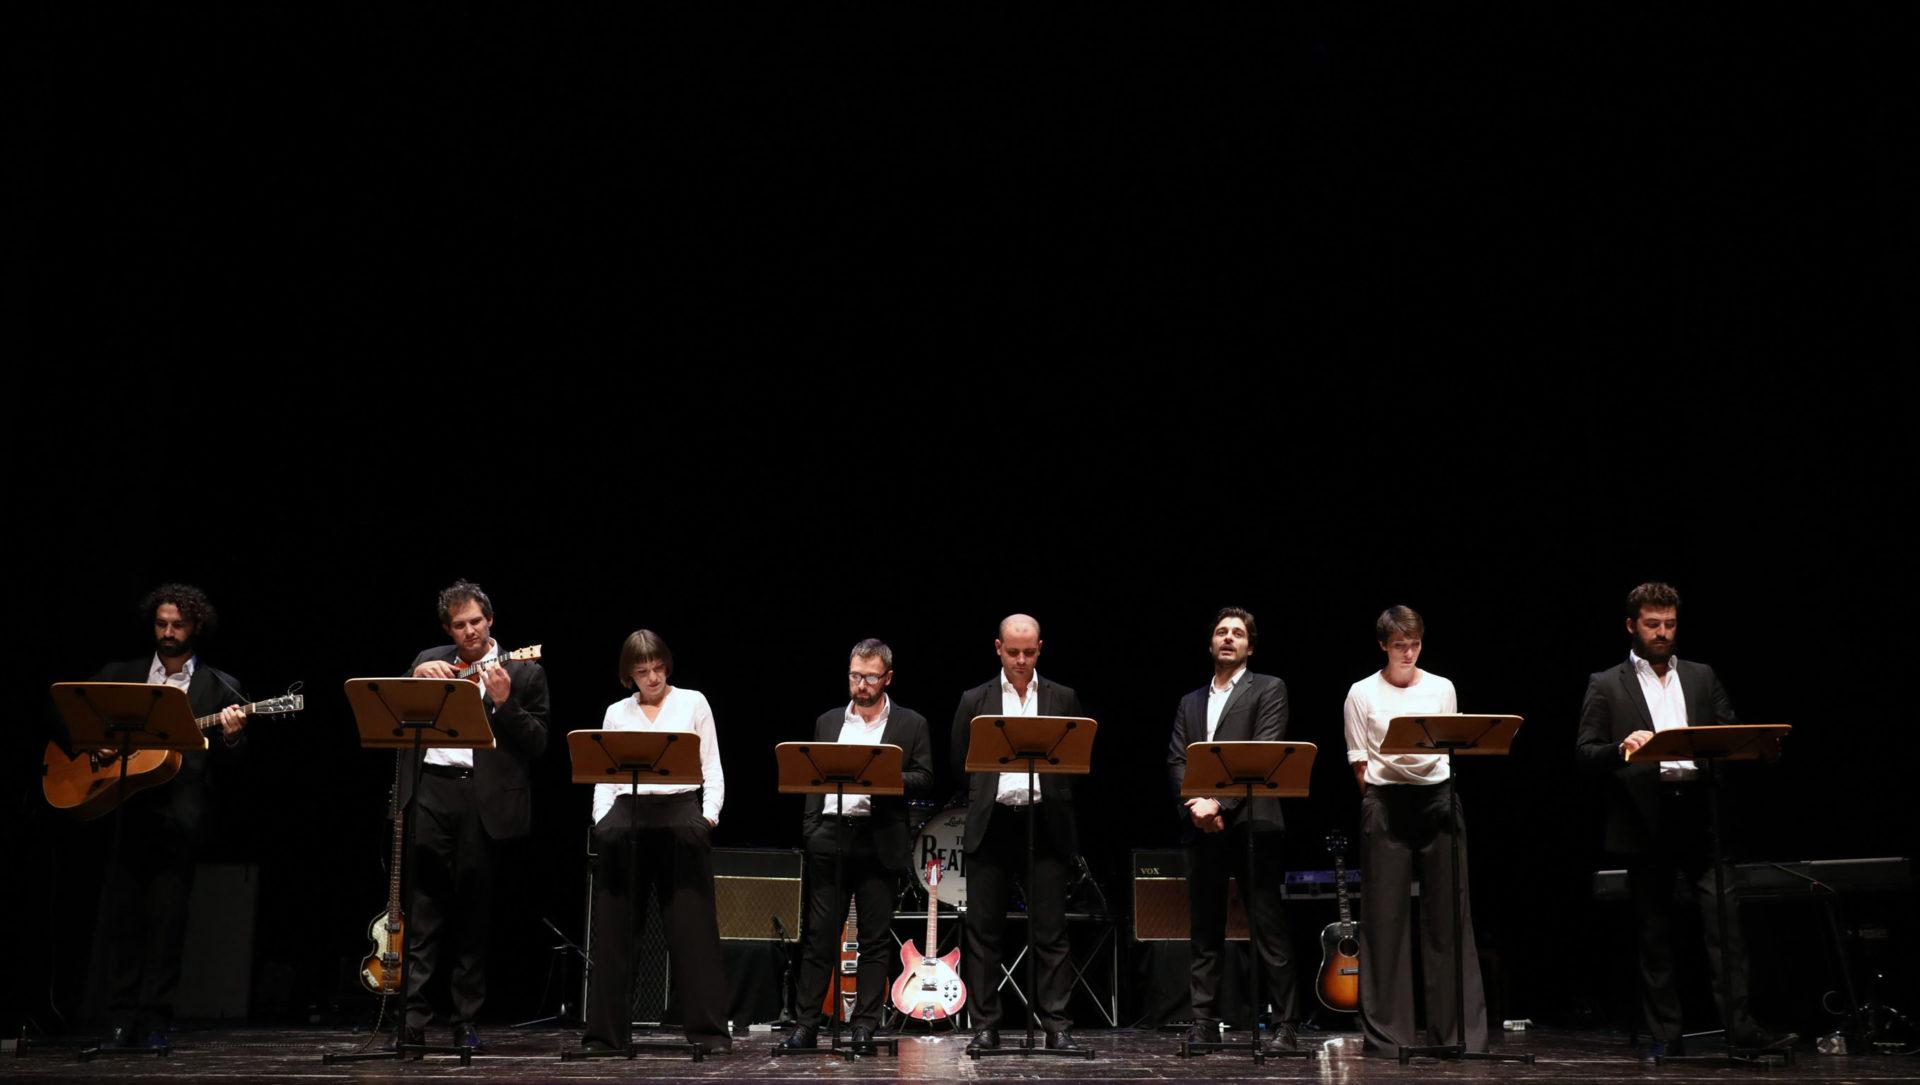 Immagina John Lennon - Poesia Festival '17 photo © Serena Campanini